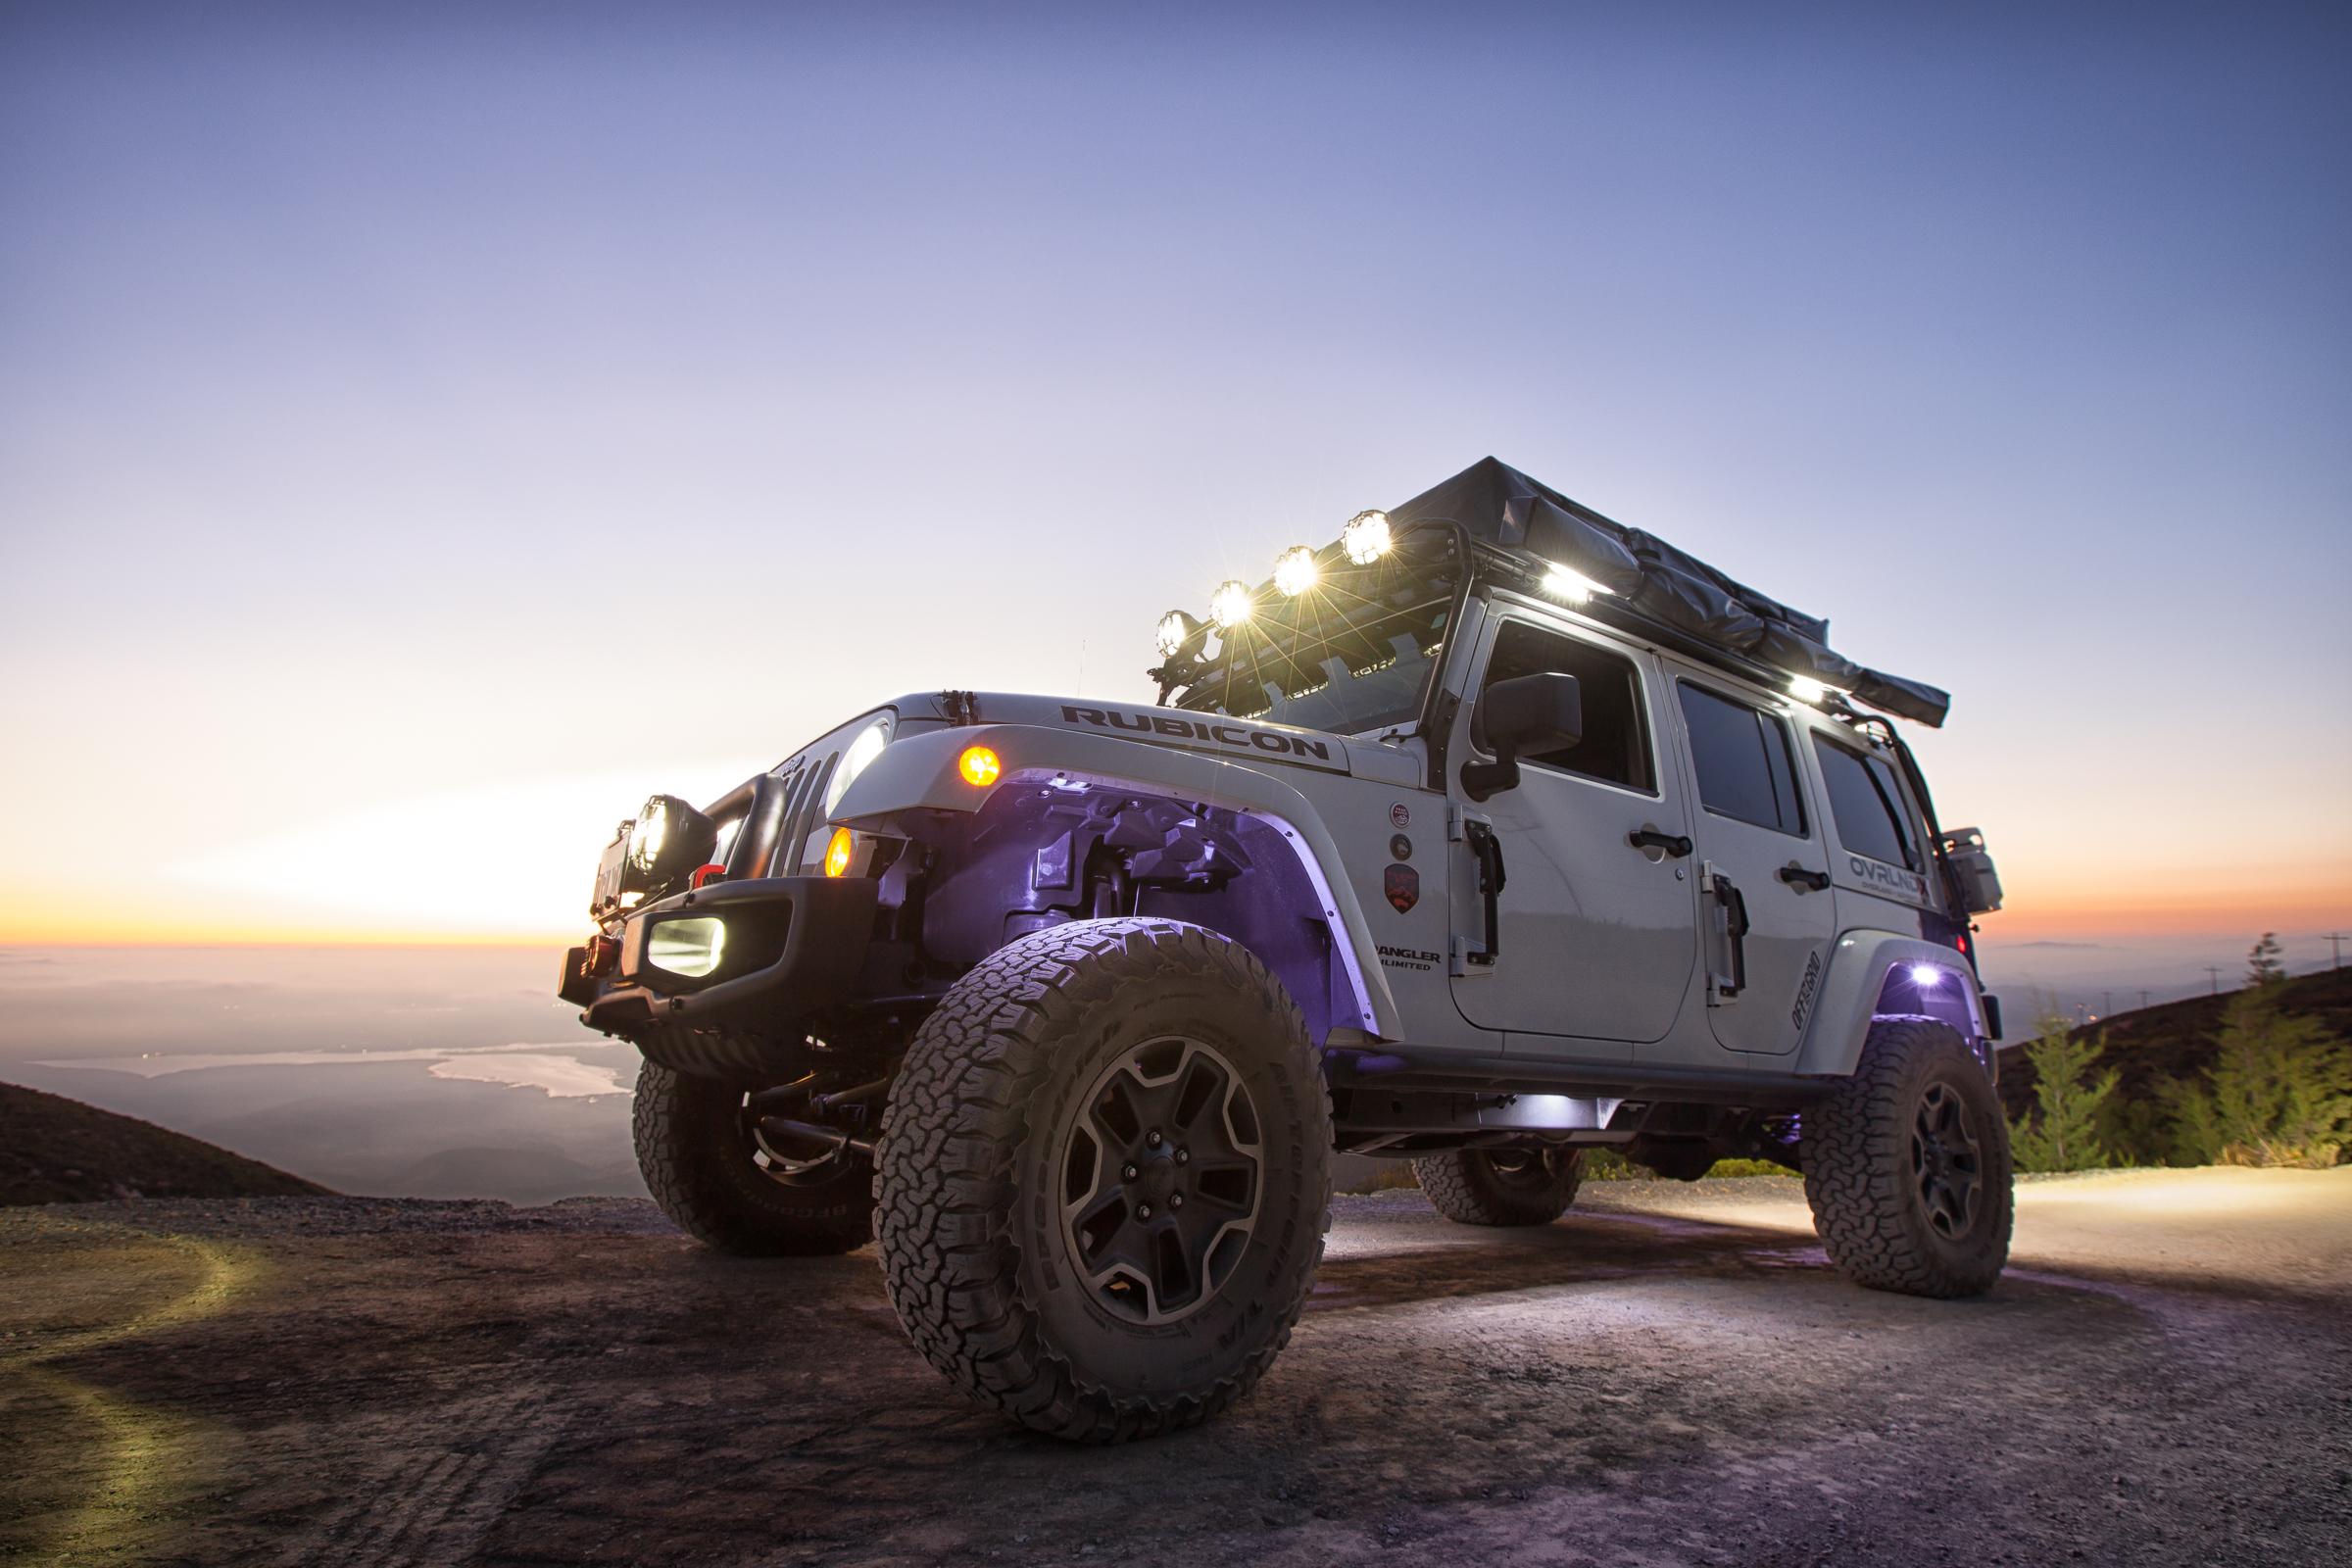 Custom Rock Crawling OverlandX Jeep JK Build - Image #01